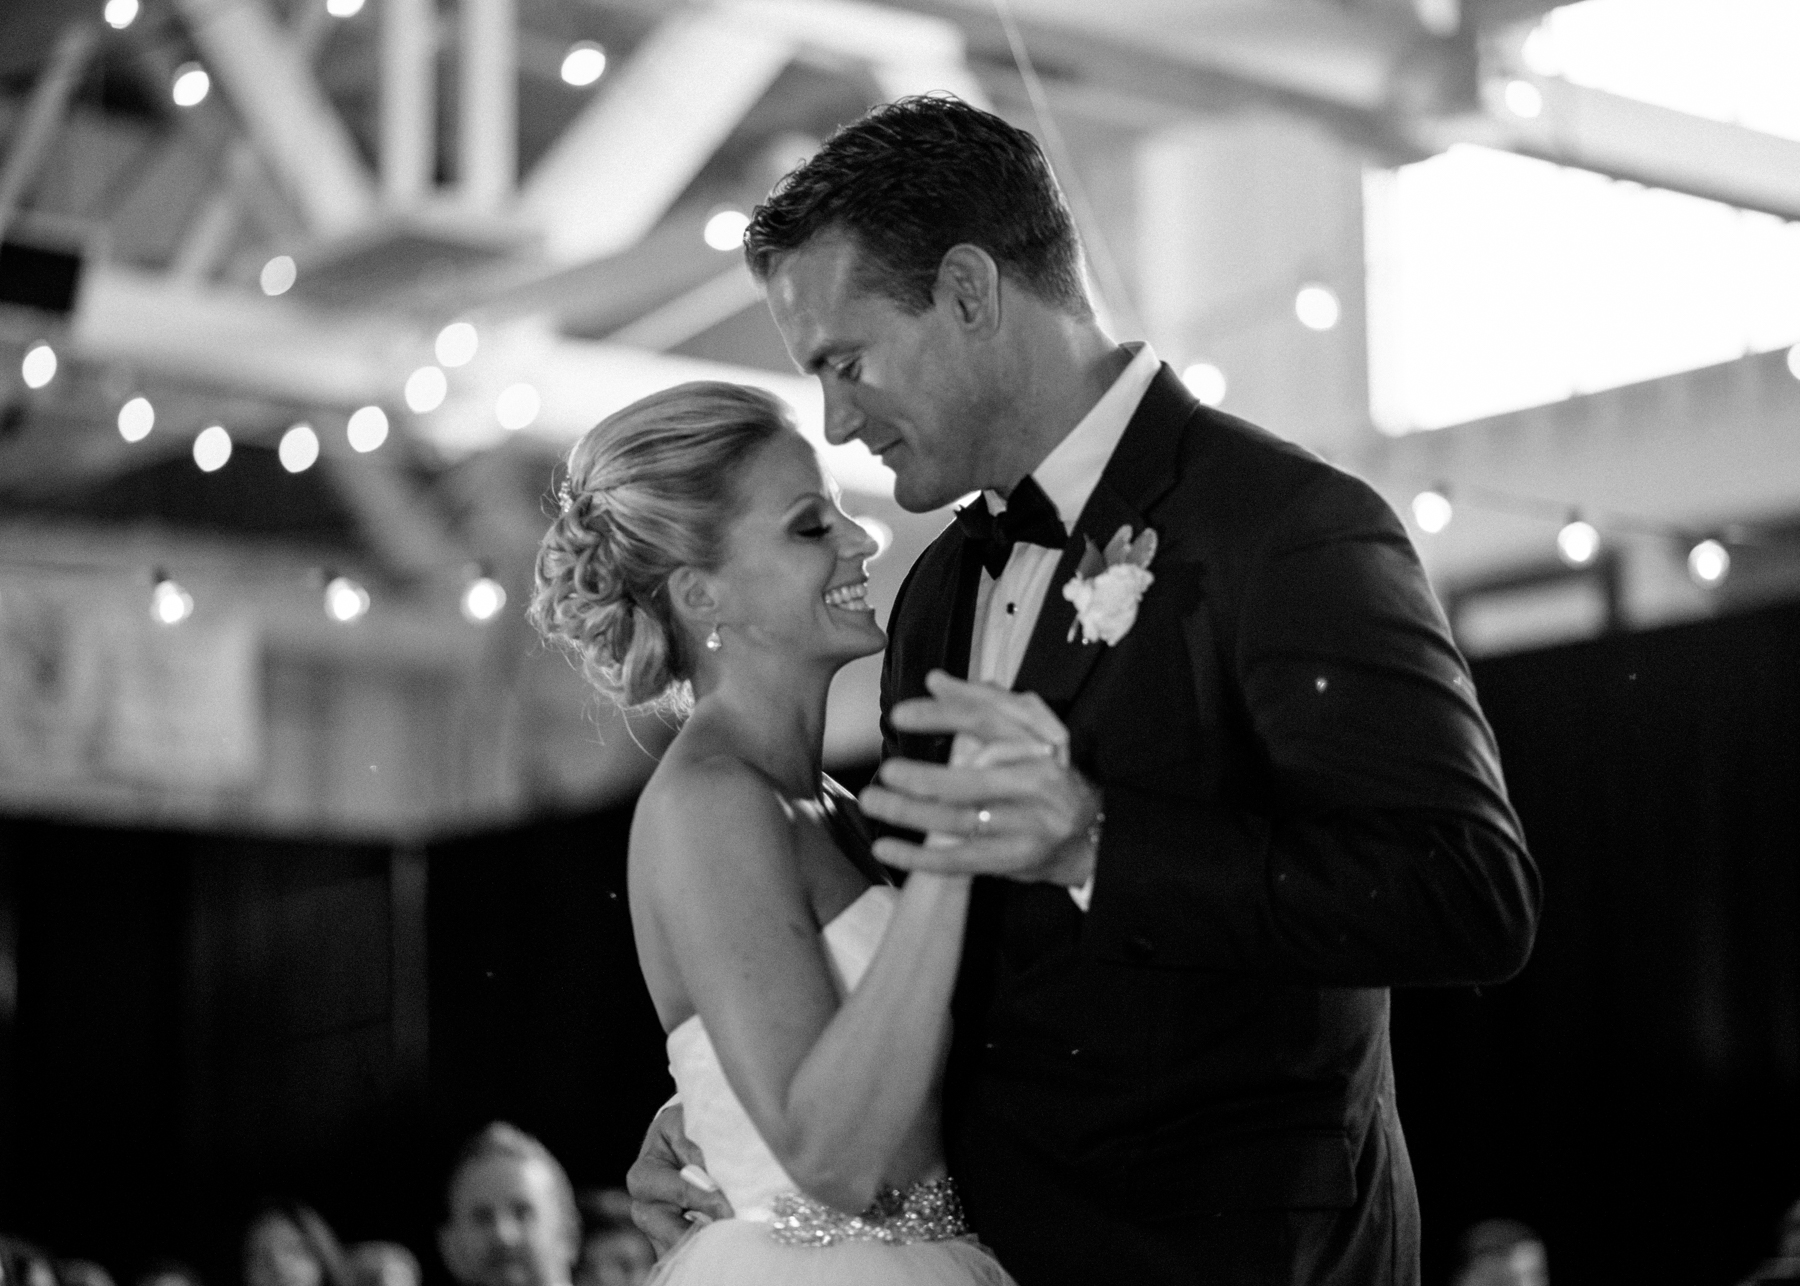 kaoverii_silva_photographer_via-herafilms_kelly_mike_wedding-30.jpg